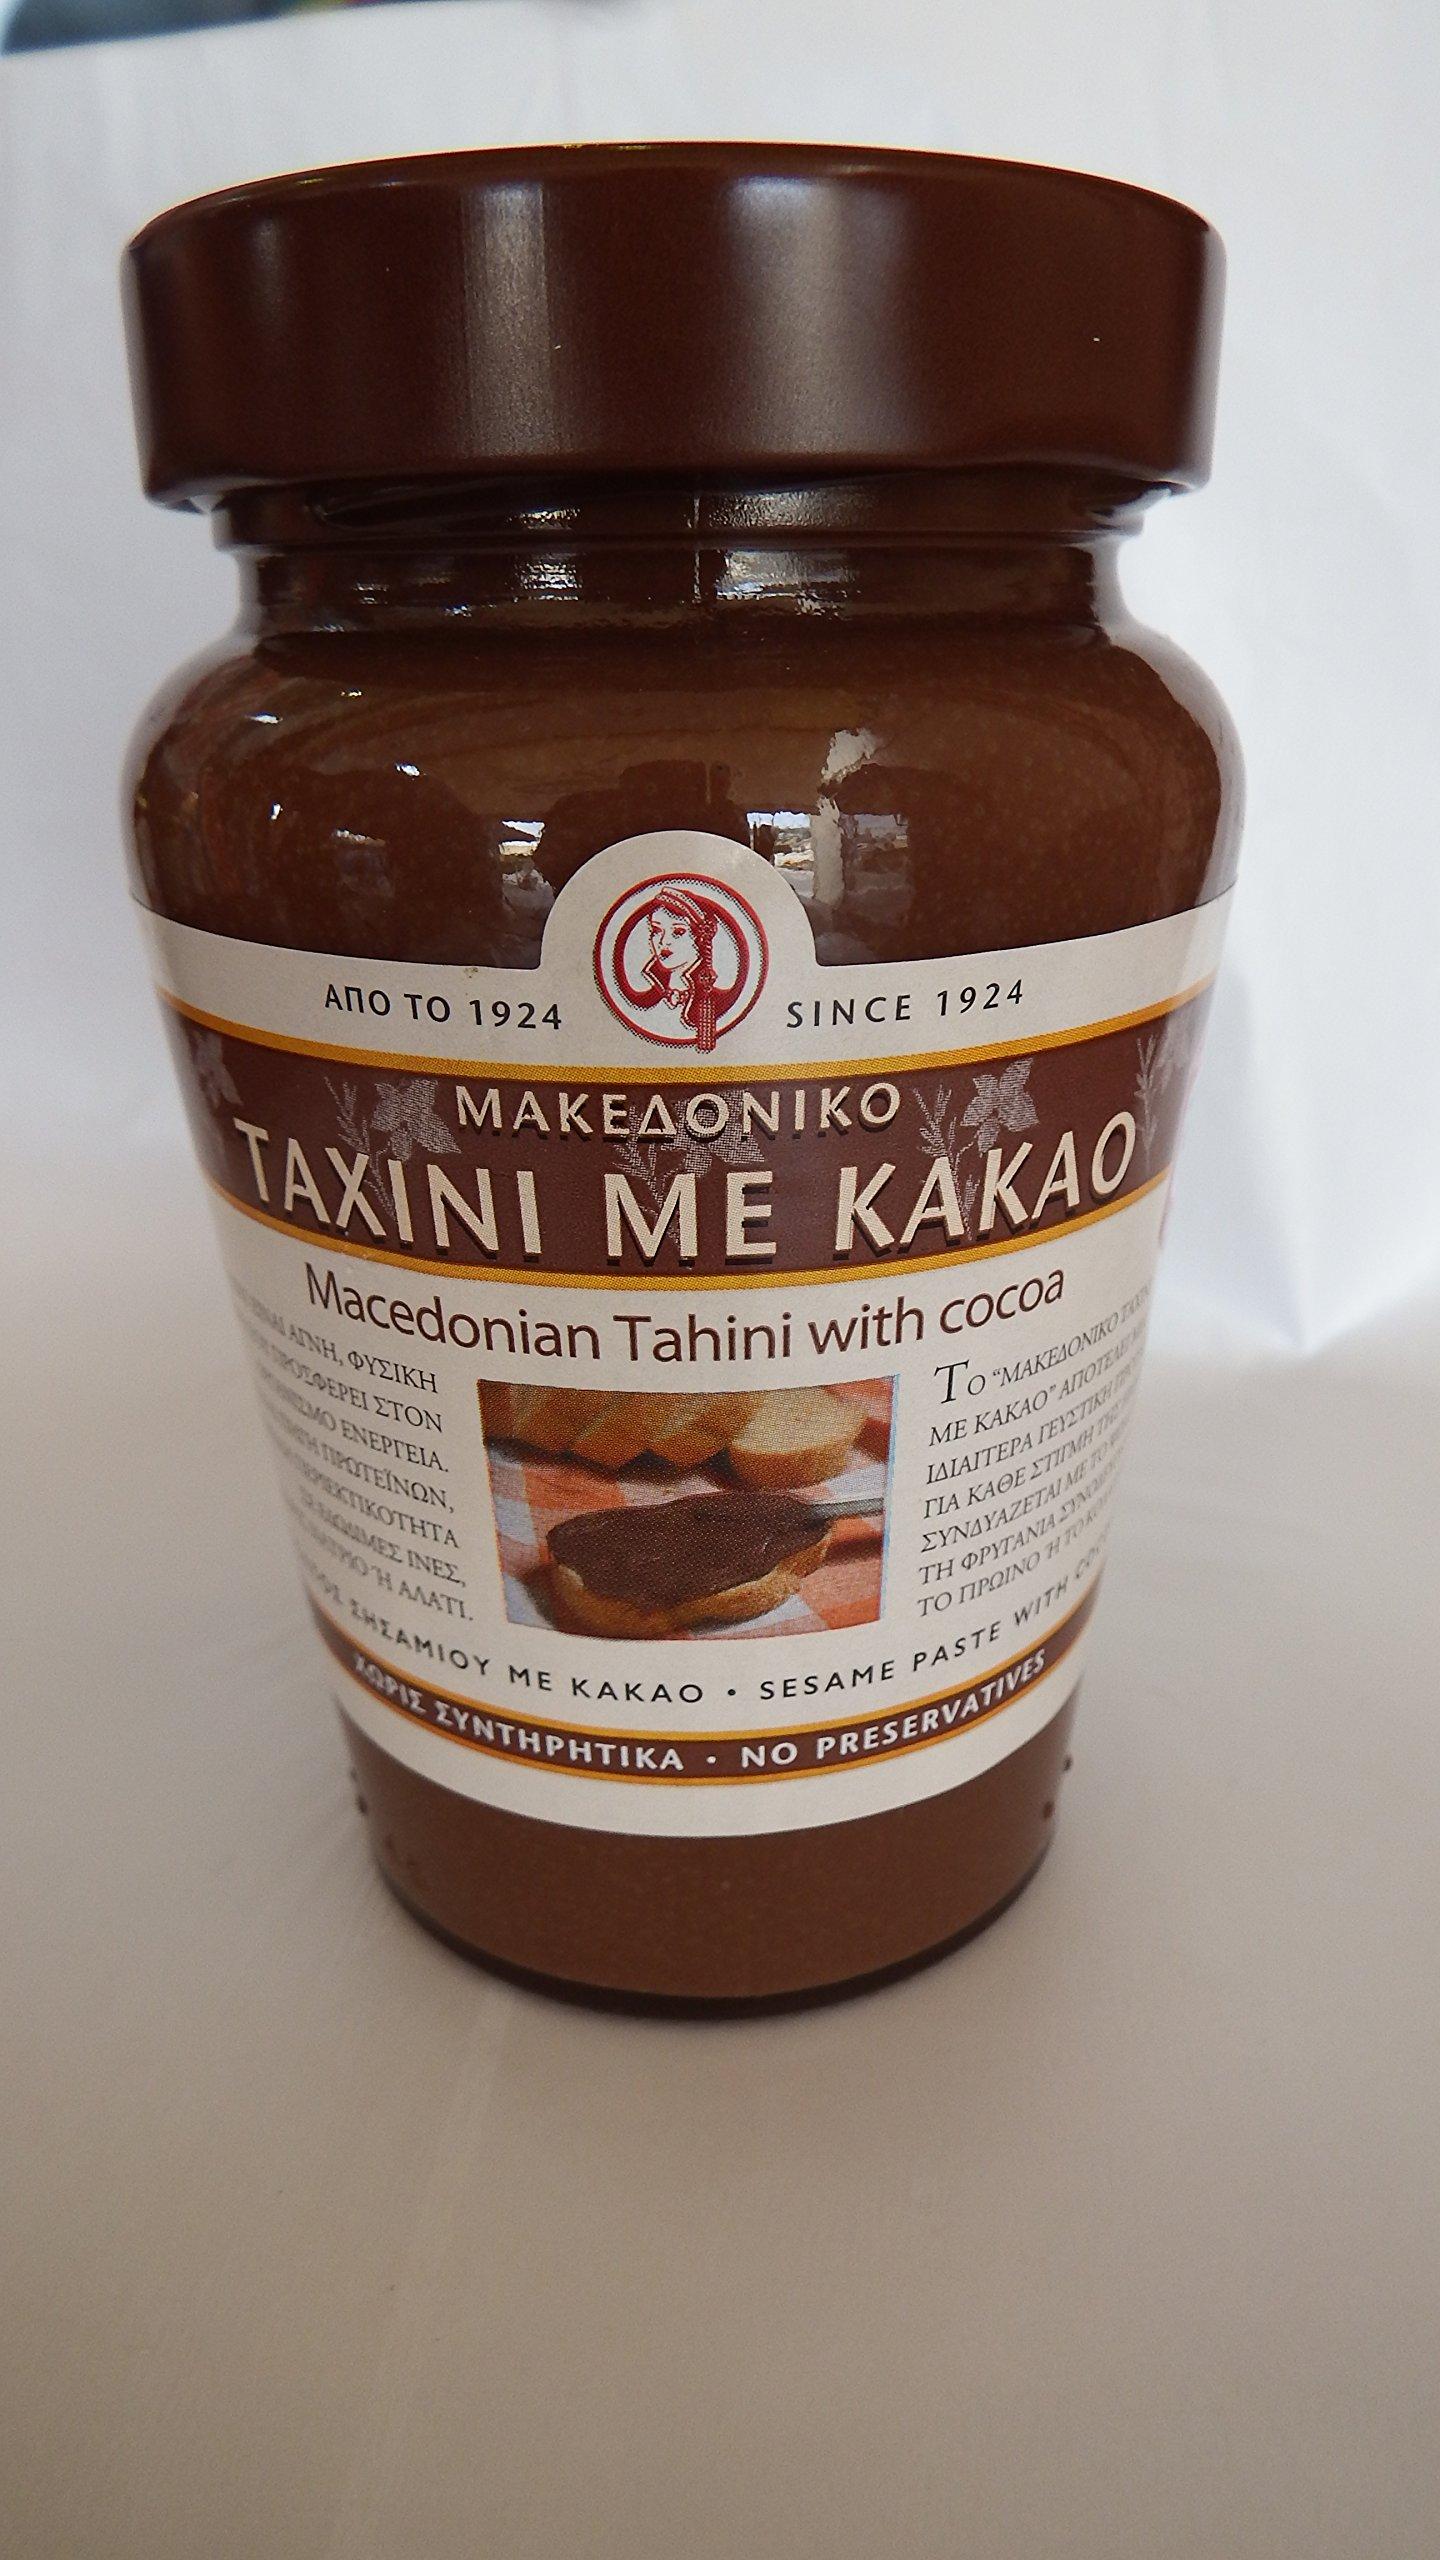 Greek Macedonian Tahini with Cocoa 350gr 12.34oz by Xaitoglou